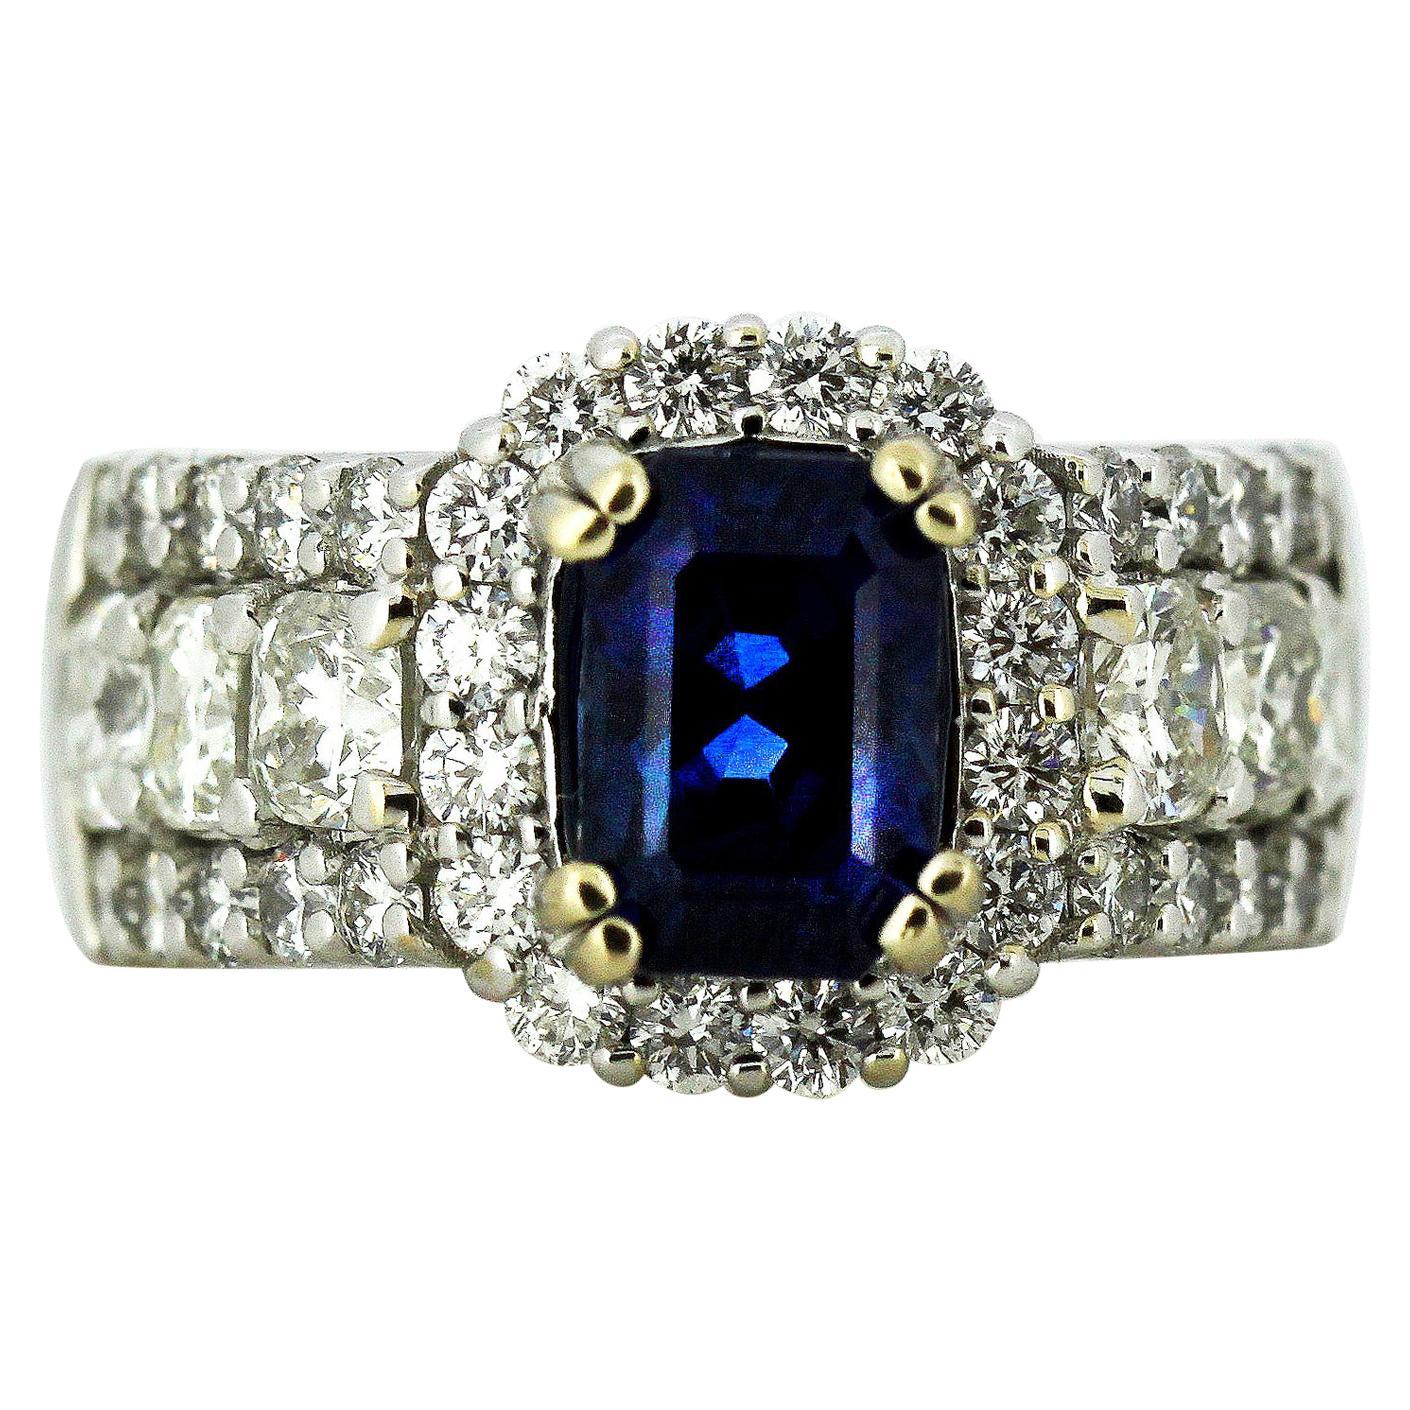 18 Karat White Gold Ladies Ring with Natural Corundum Sapphire with Diamonds